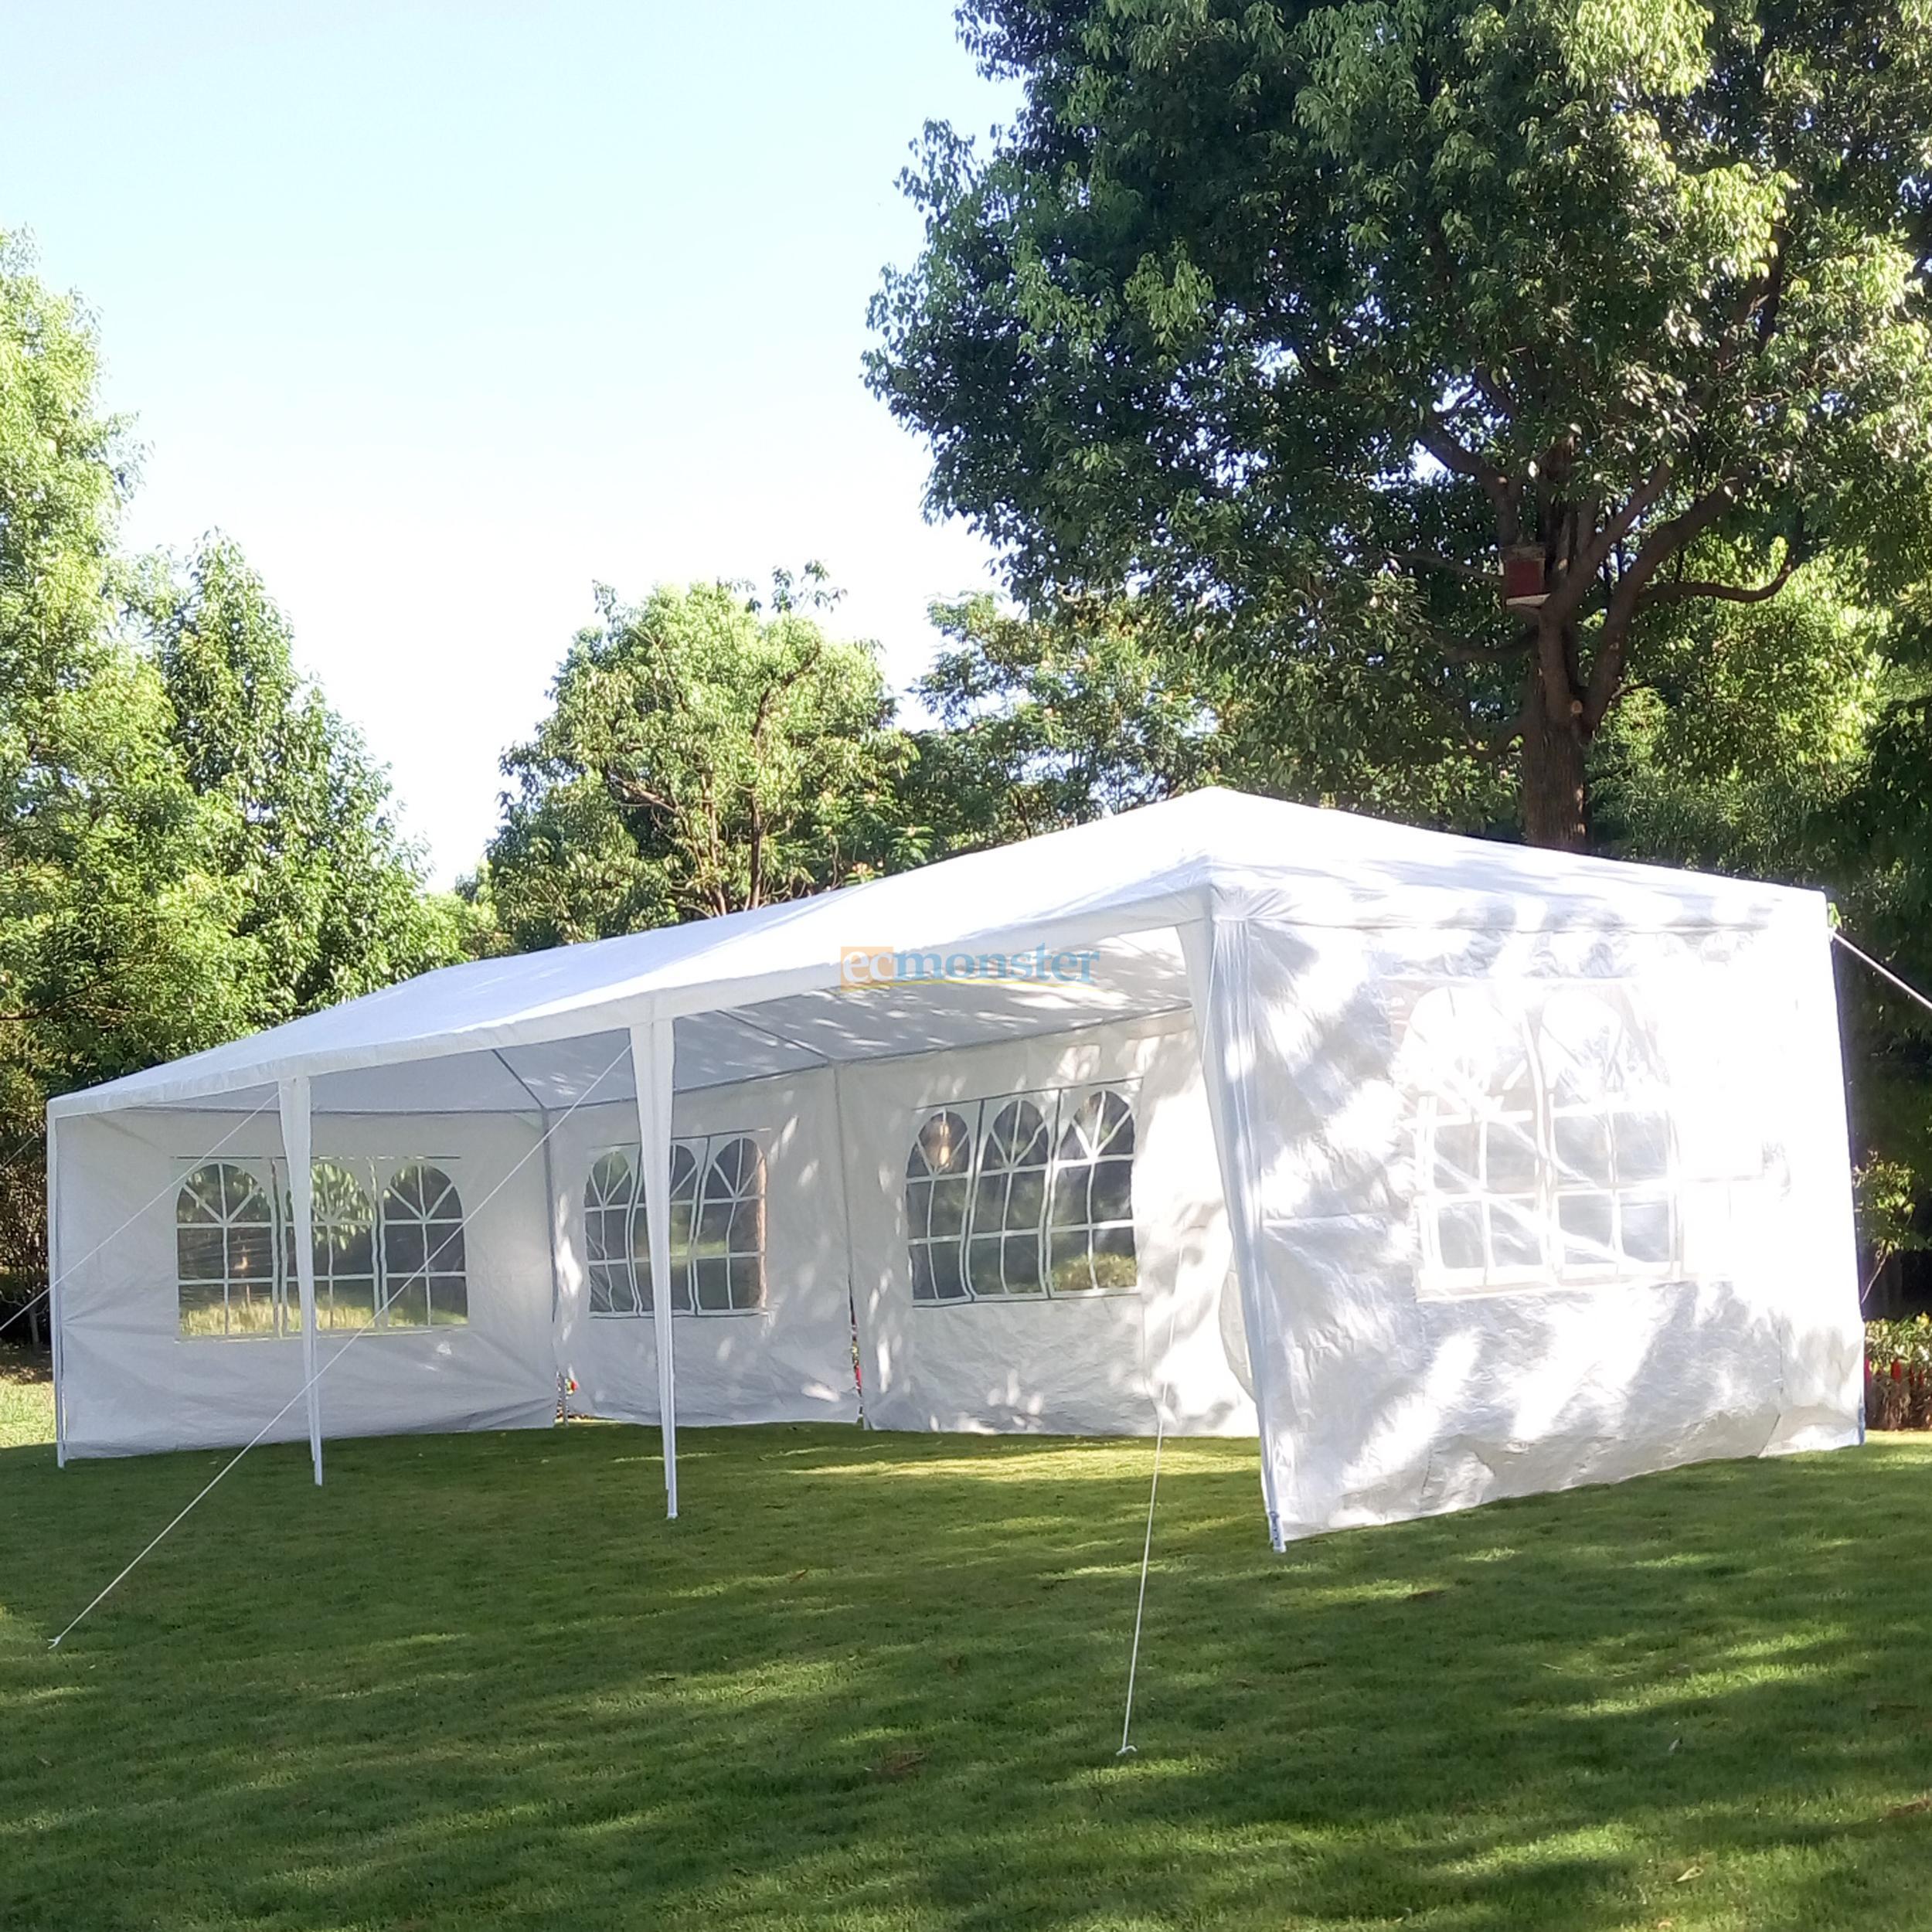 10 39 X 30 39 Canopy Outdoor Wedding Party Tent Gazebo